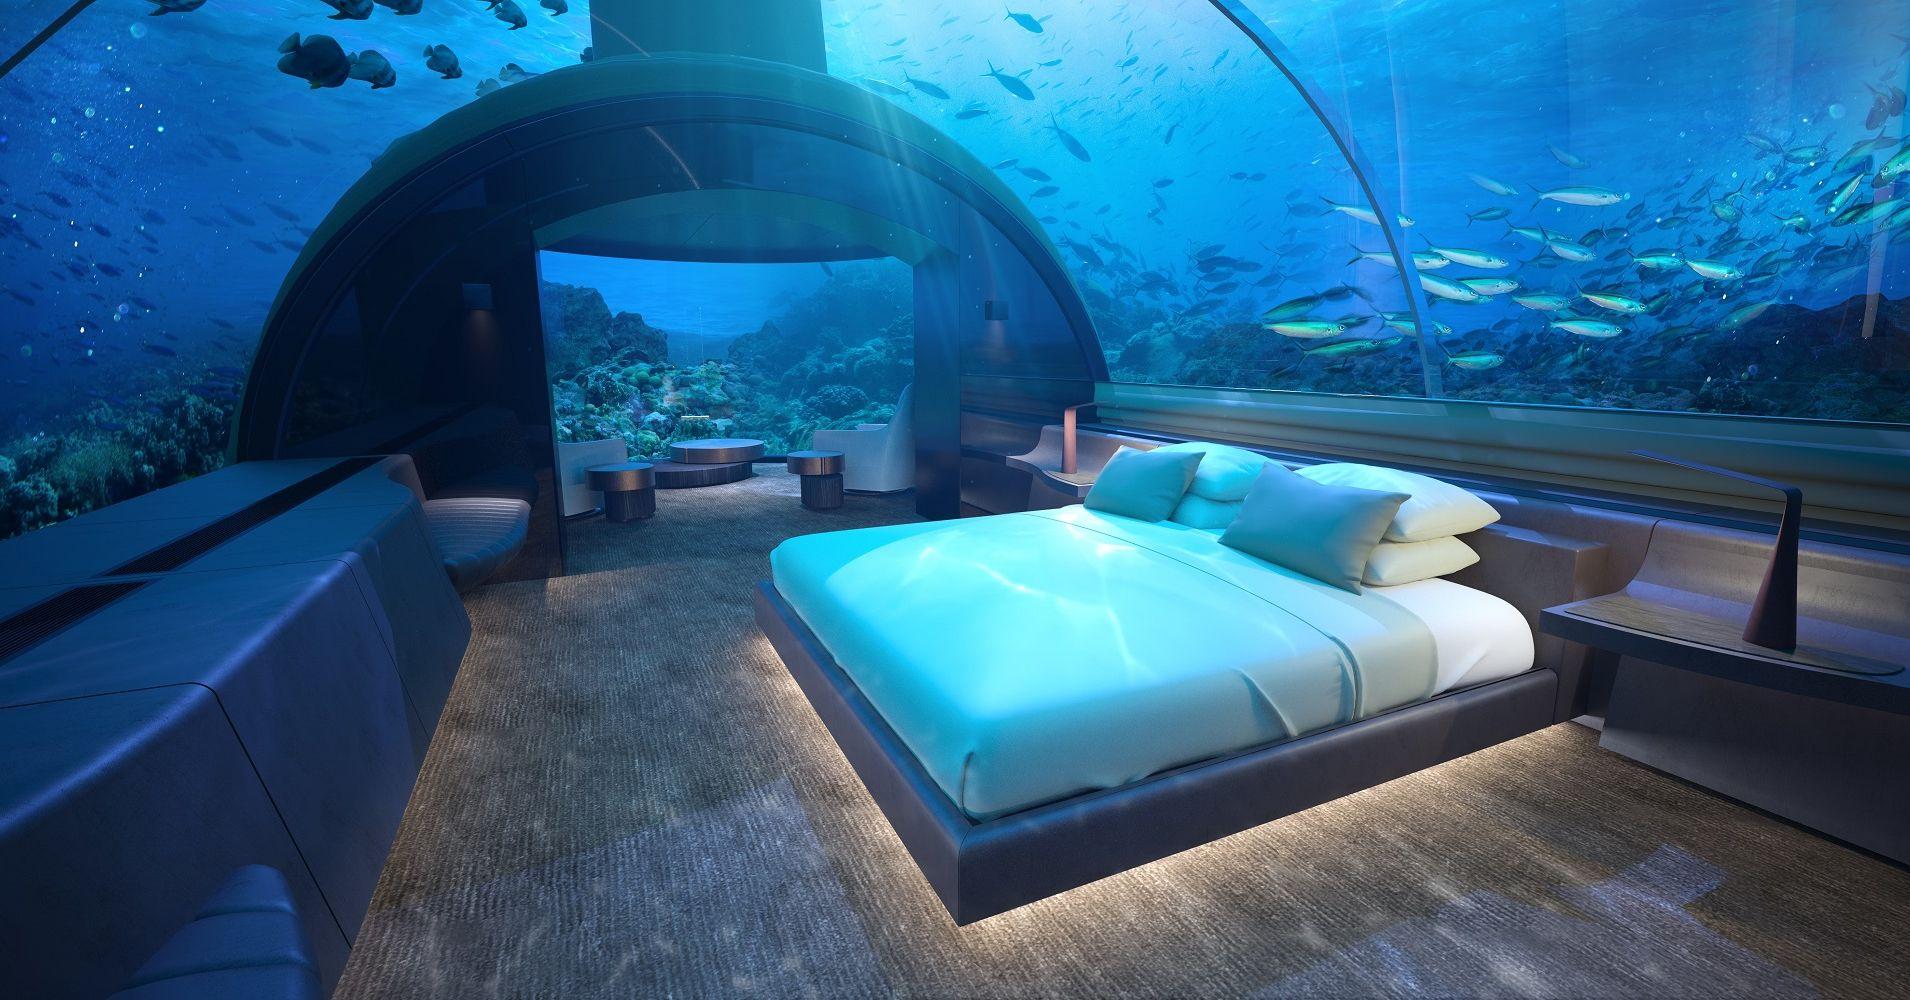 The Muraka Underwater Villa in Maldives